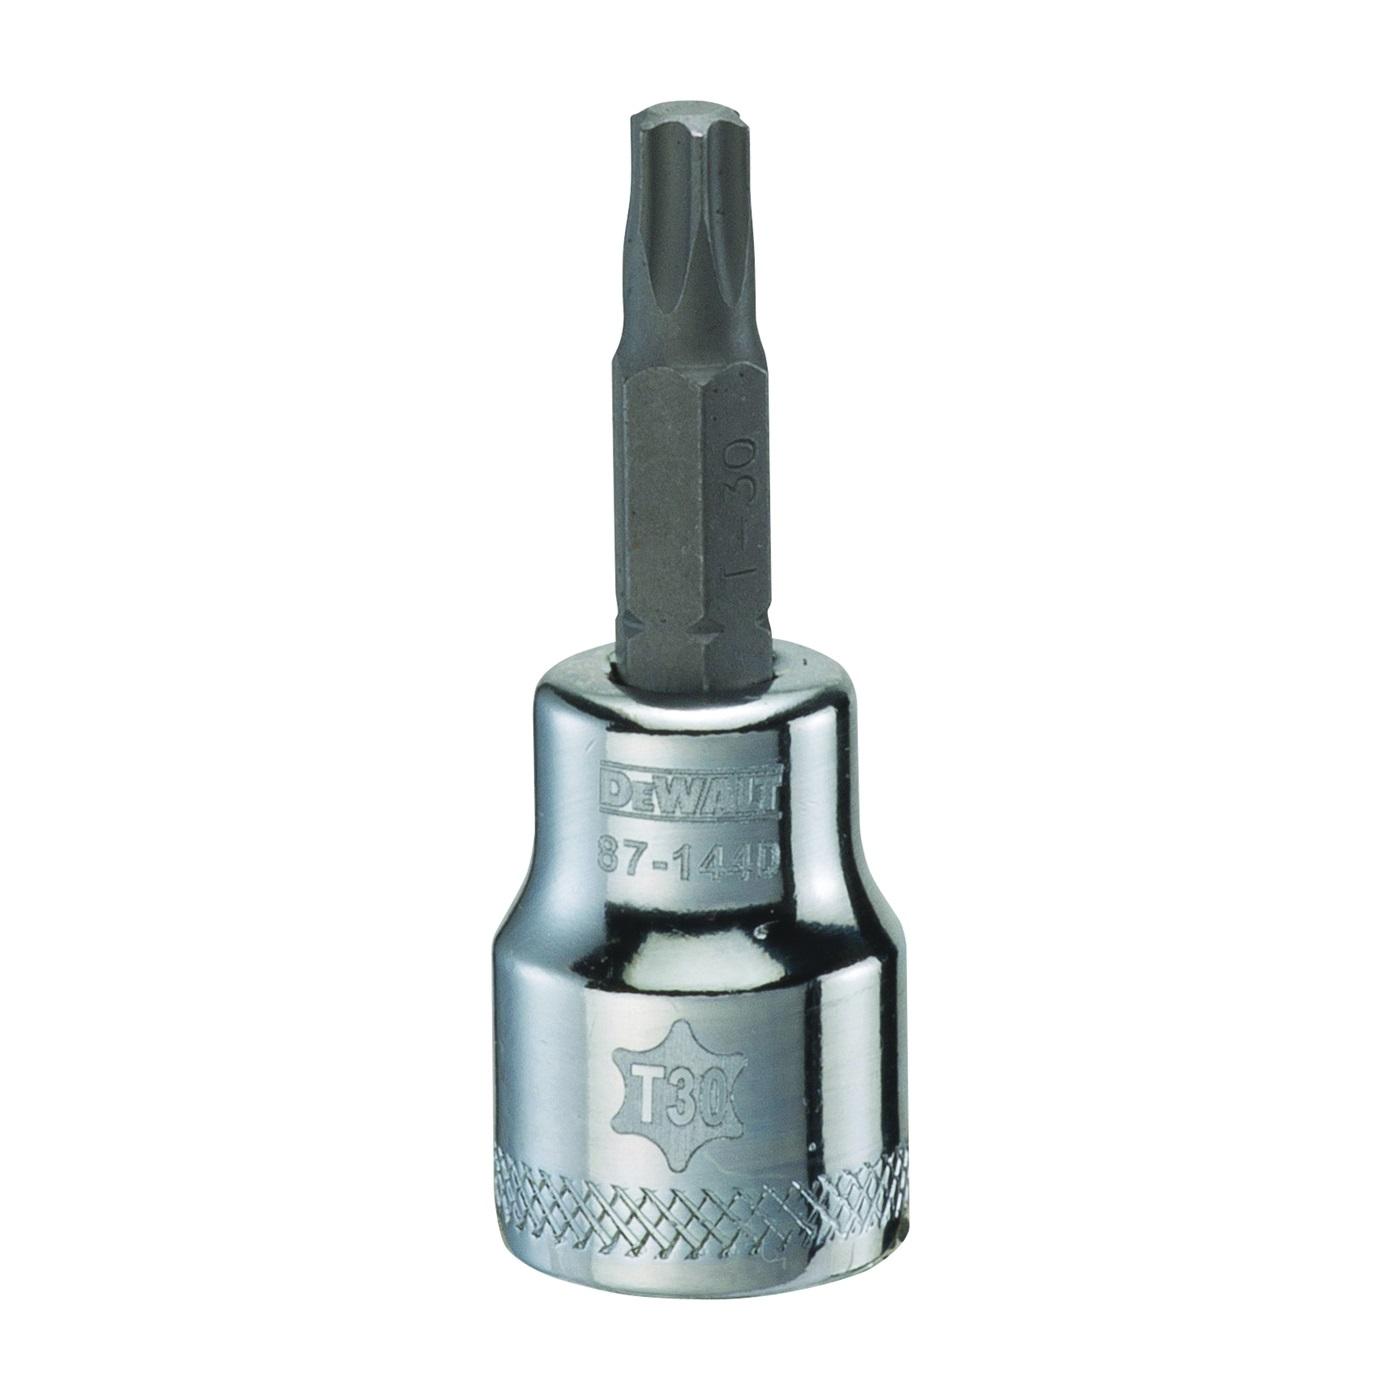 Picture of DeWALT DWMT87144OSP Torx Bit Socket, T30 Tip, 3/8 in Drive, Polished Chrome Vanadium